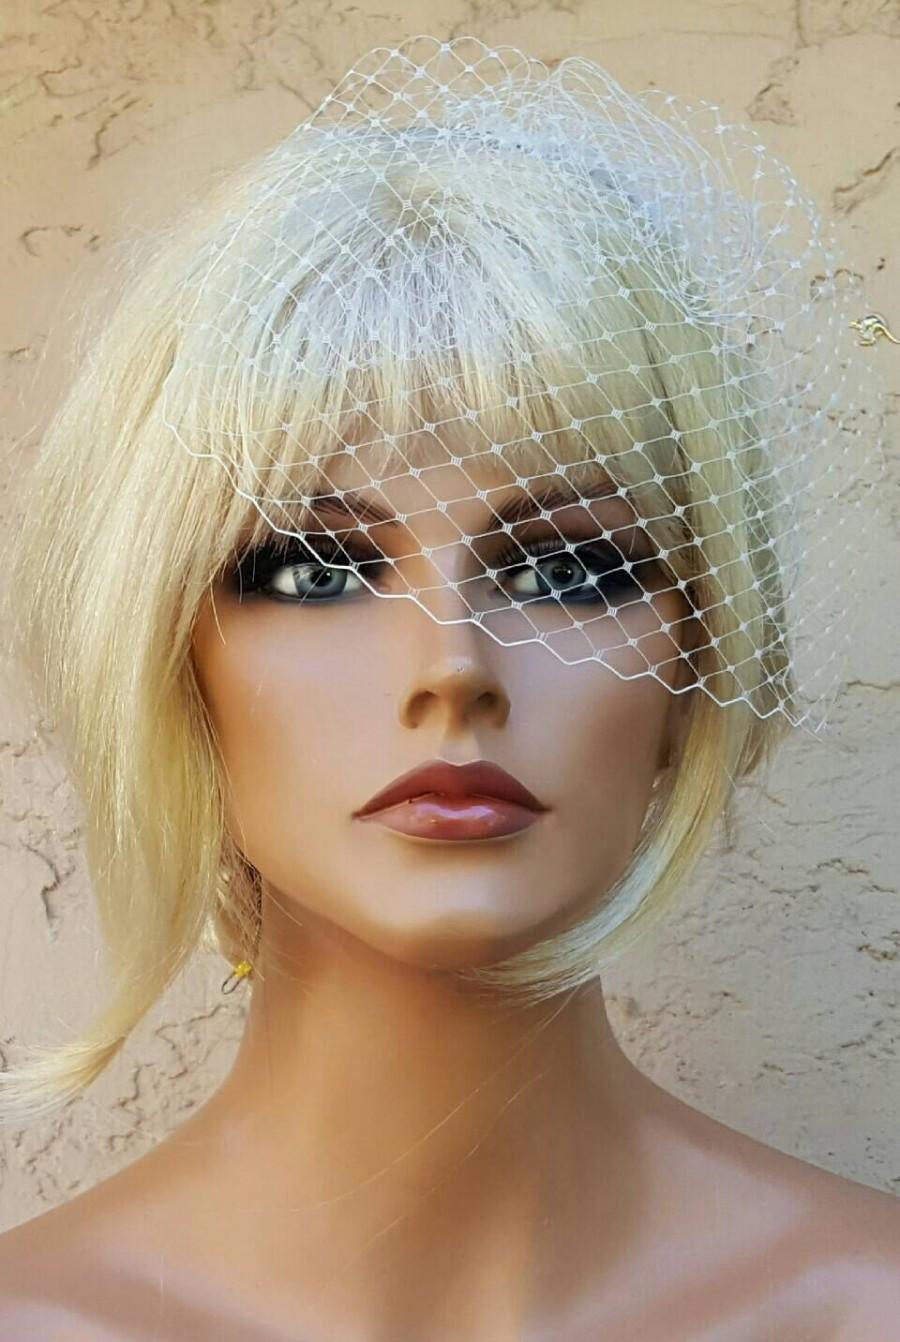 Mariage - Ivory French Net Bridal Veil, Wedding Veil, 7 inch Veil, Small Veil, VIntage Style Veil, White Bridal Veil, Wedding Veils with Combs